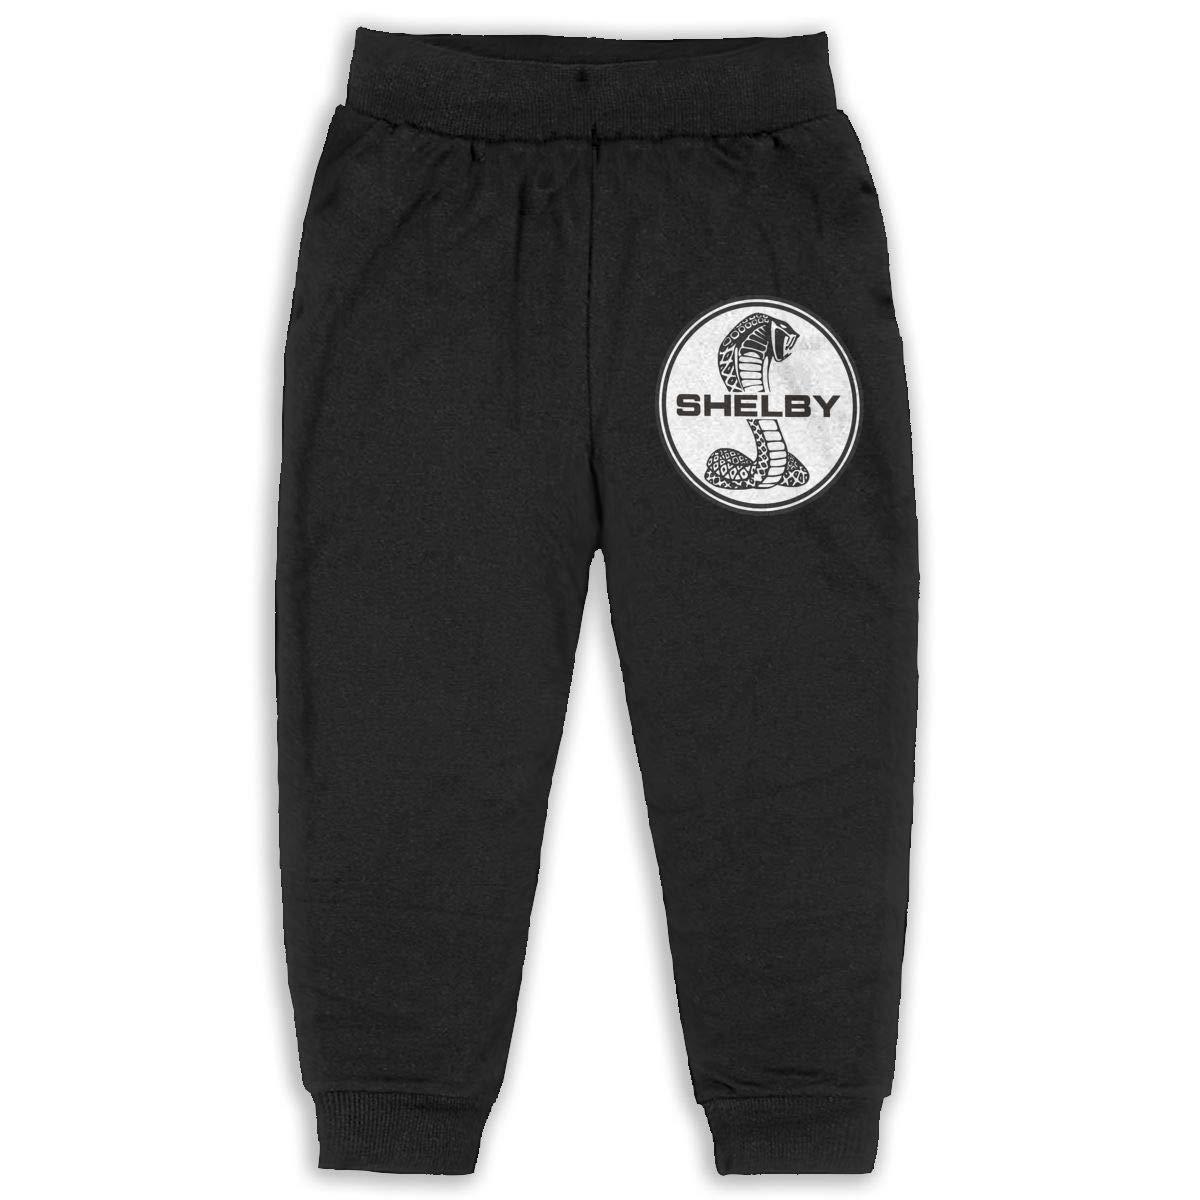 NEST-Homer Childrens Sweatpants Shelby Symbol Boys and Girls Jogger Long Pants Sweatpants Leggings